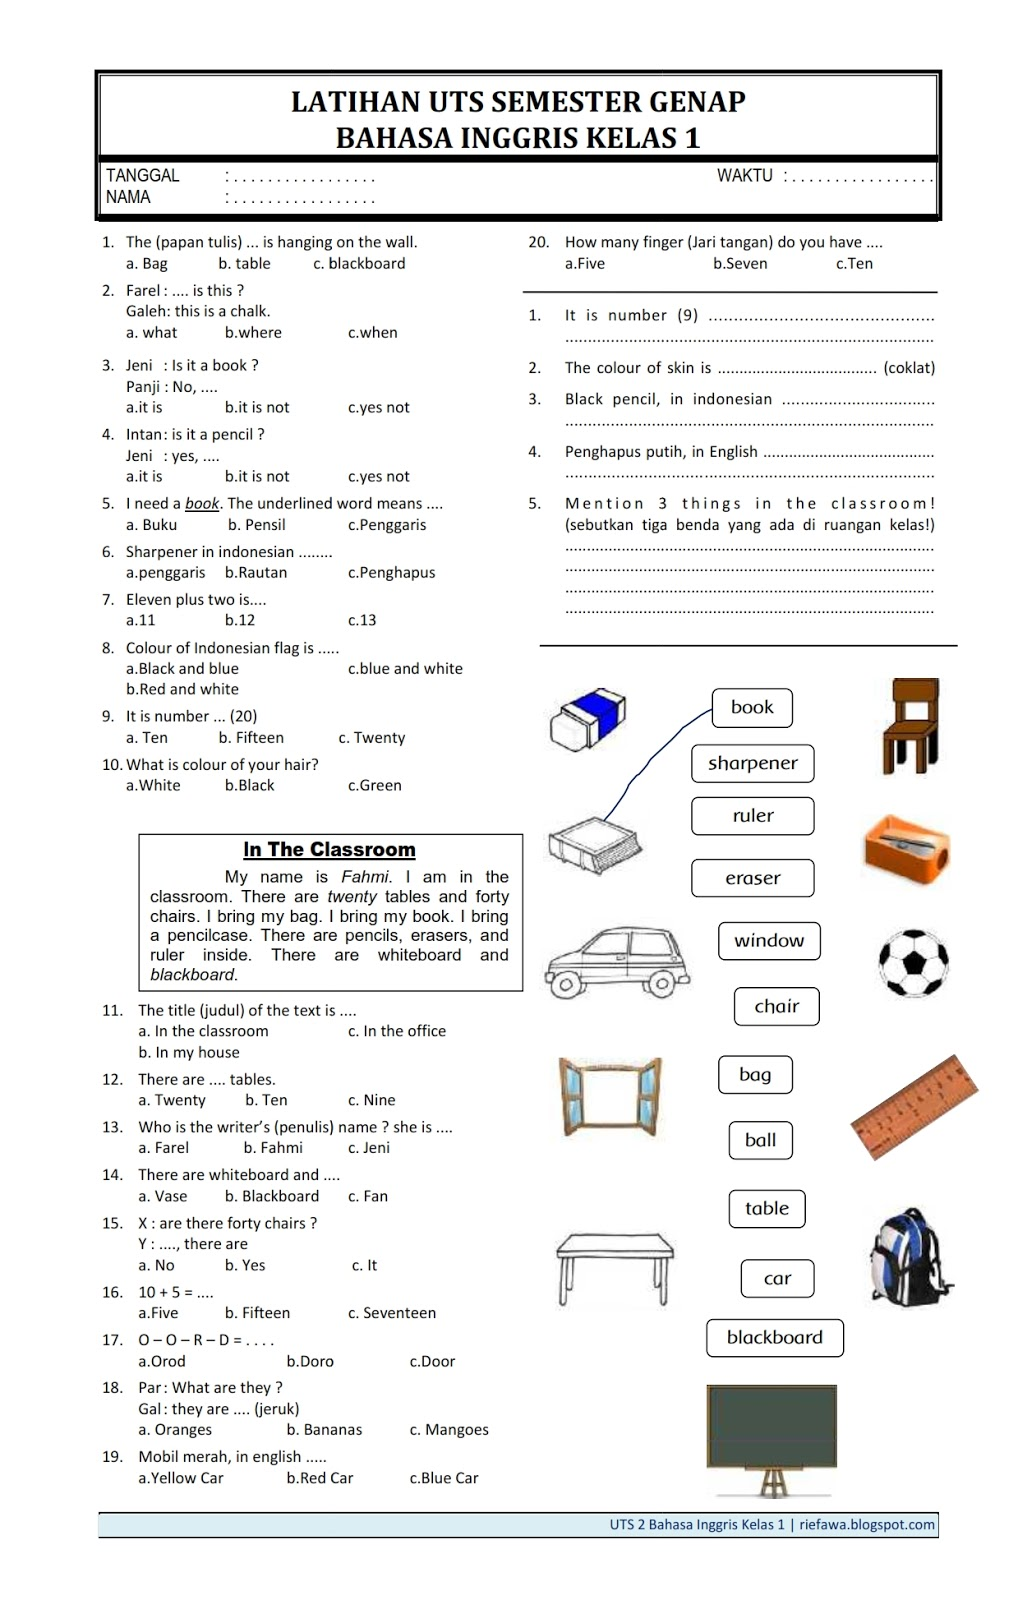 1 muatan sbdp by irma7laili7fitria. Contoh Soal Bahasa Inggris Things In The Classroom - BangSoal